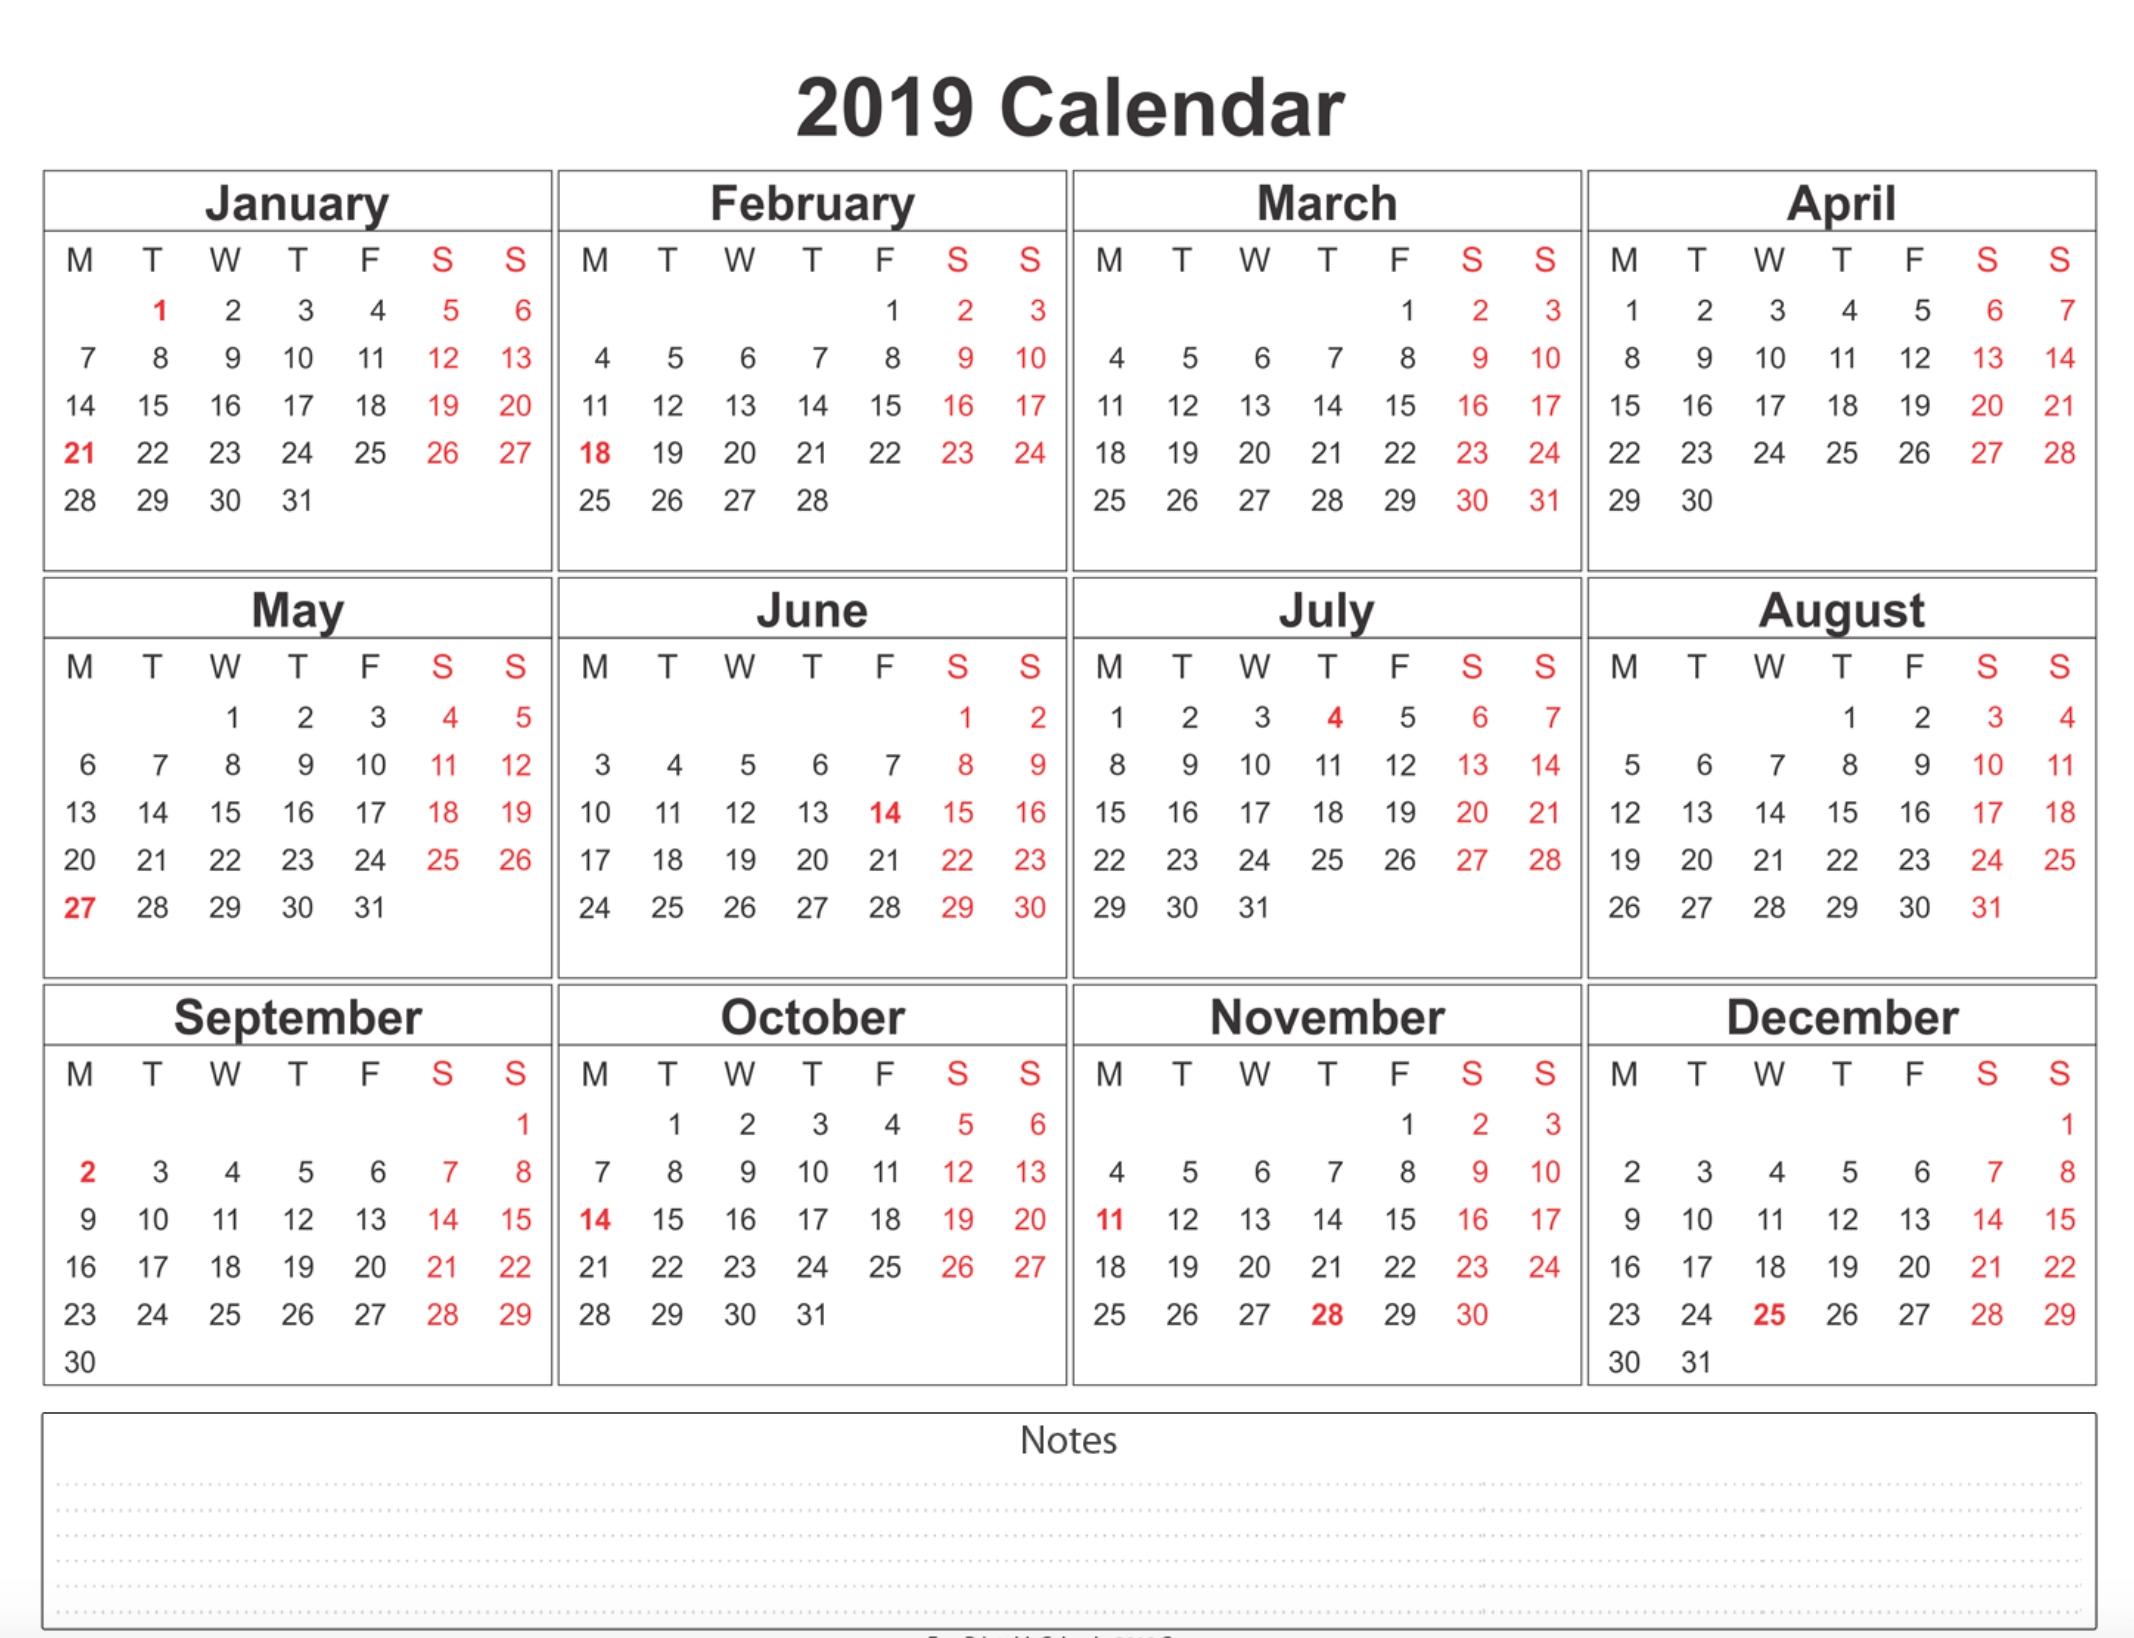 Free Printable Calendar 2019 With Holidays   Blank 12 Month Calendar Calendar 2019 Monthly Pdf